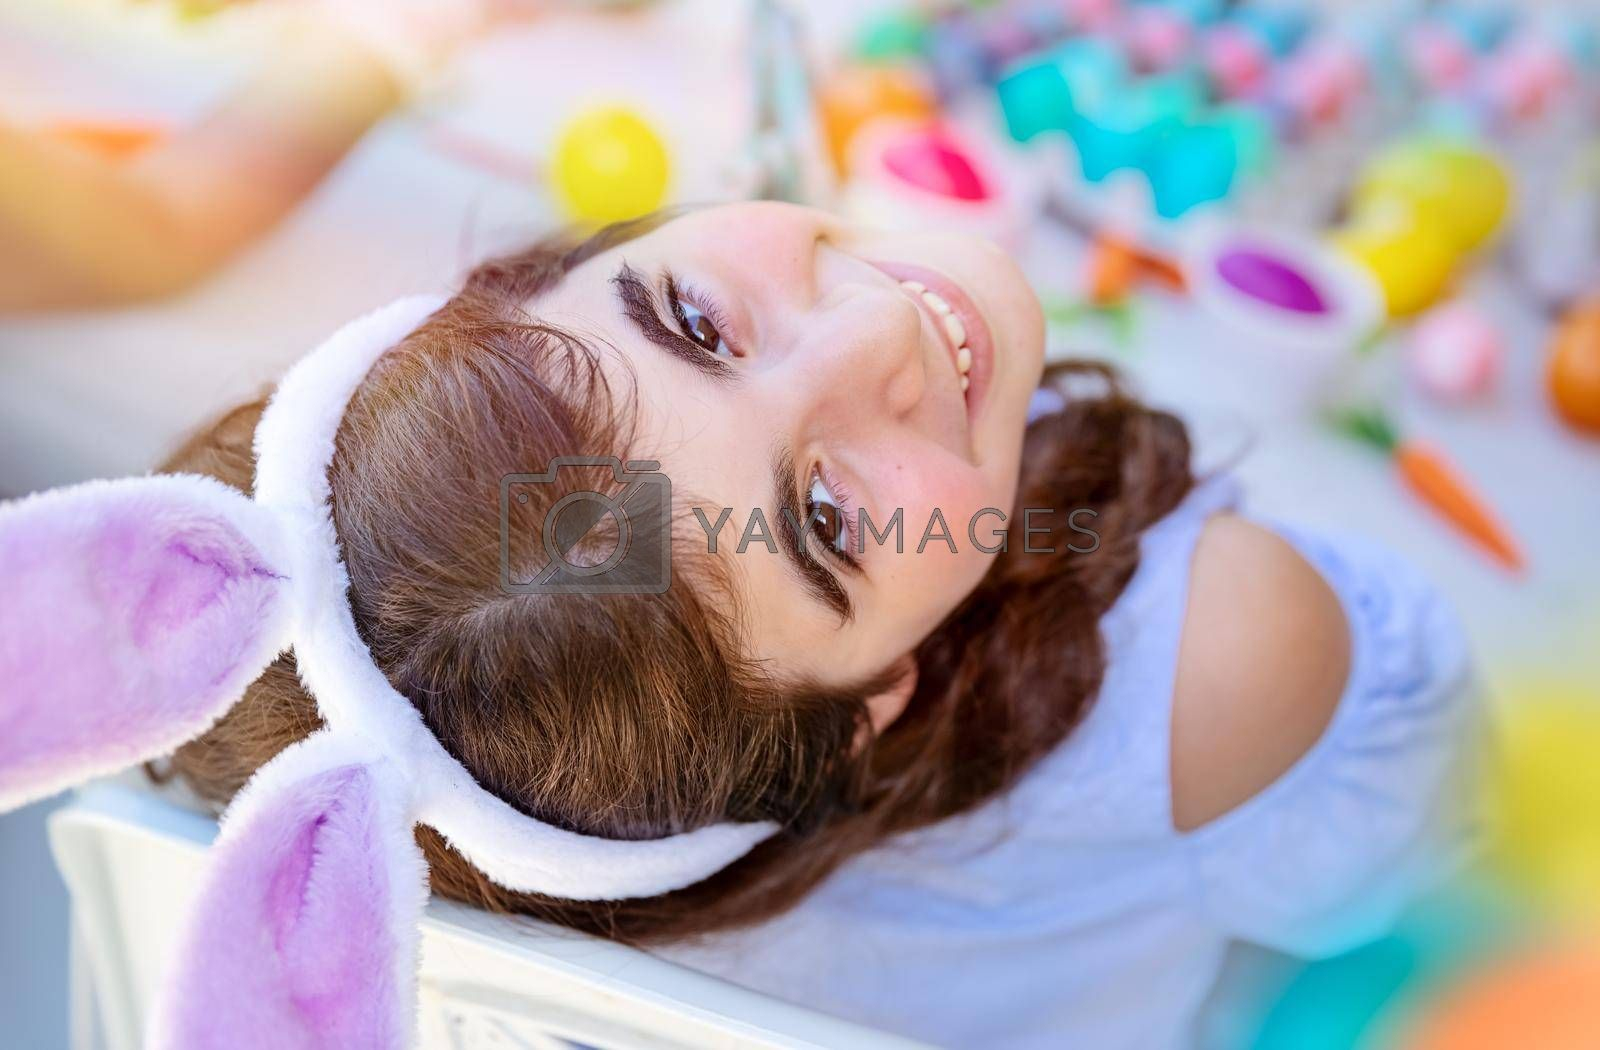 Royalty free image of Little Girl Enjoying Easter by Anna_Omelchenko